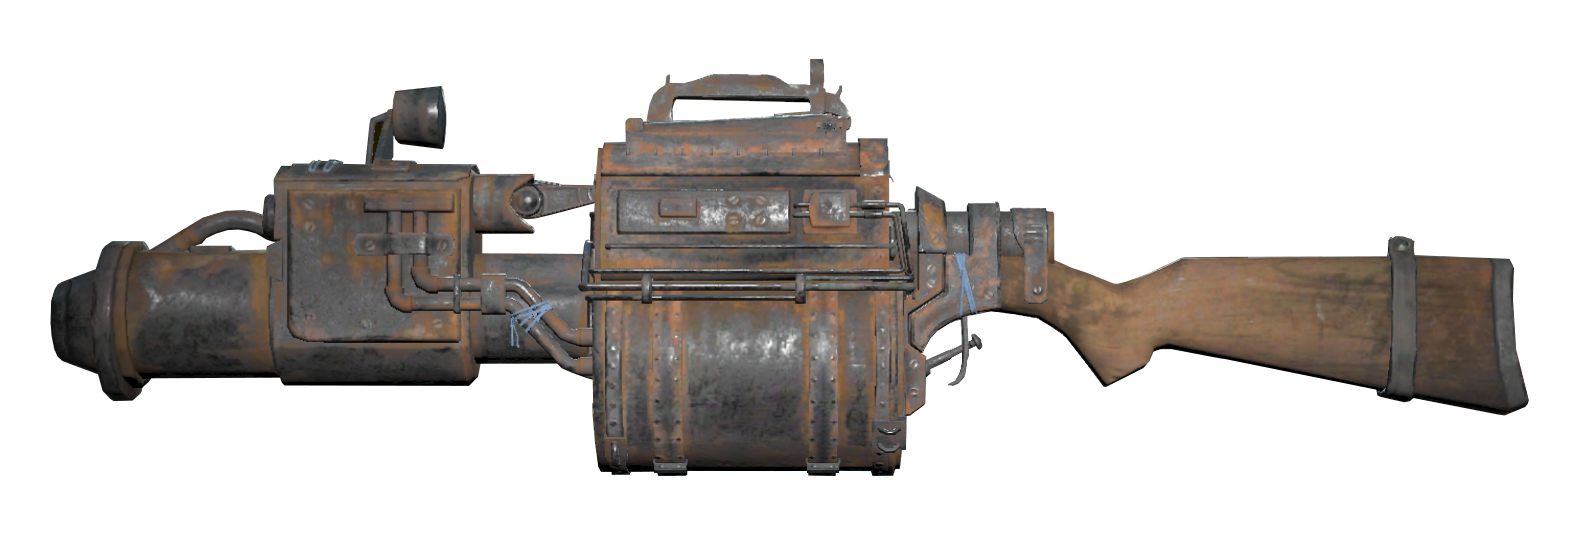 Railway rifle (Fallout 76)